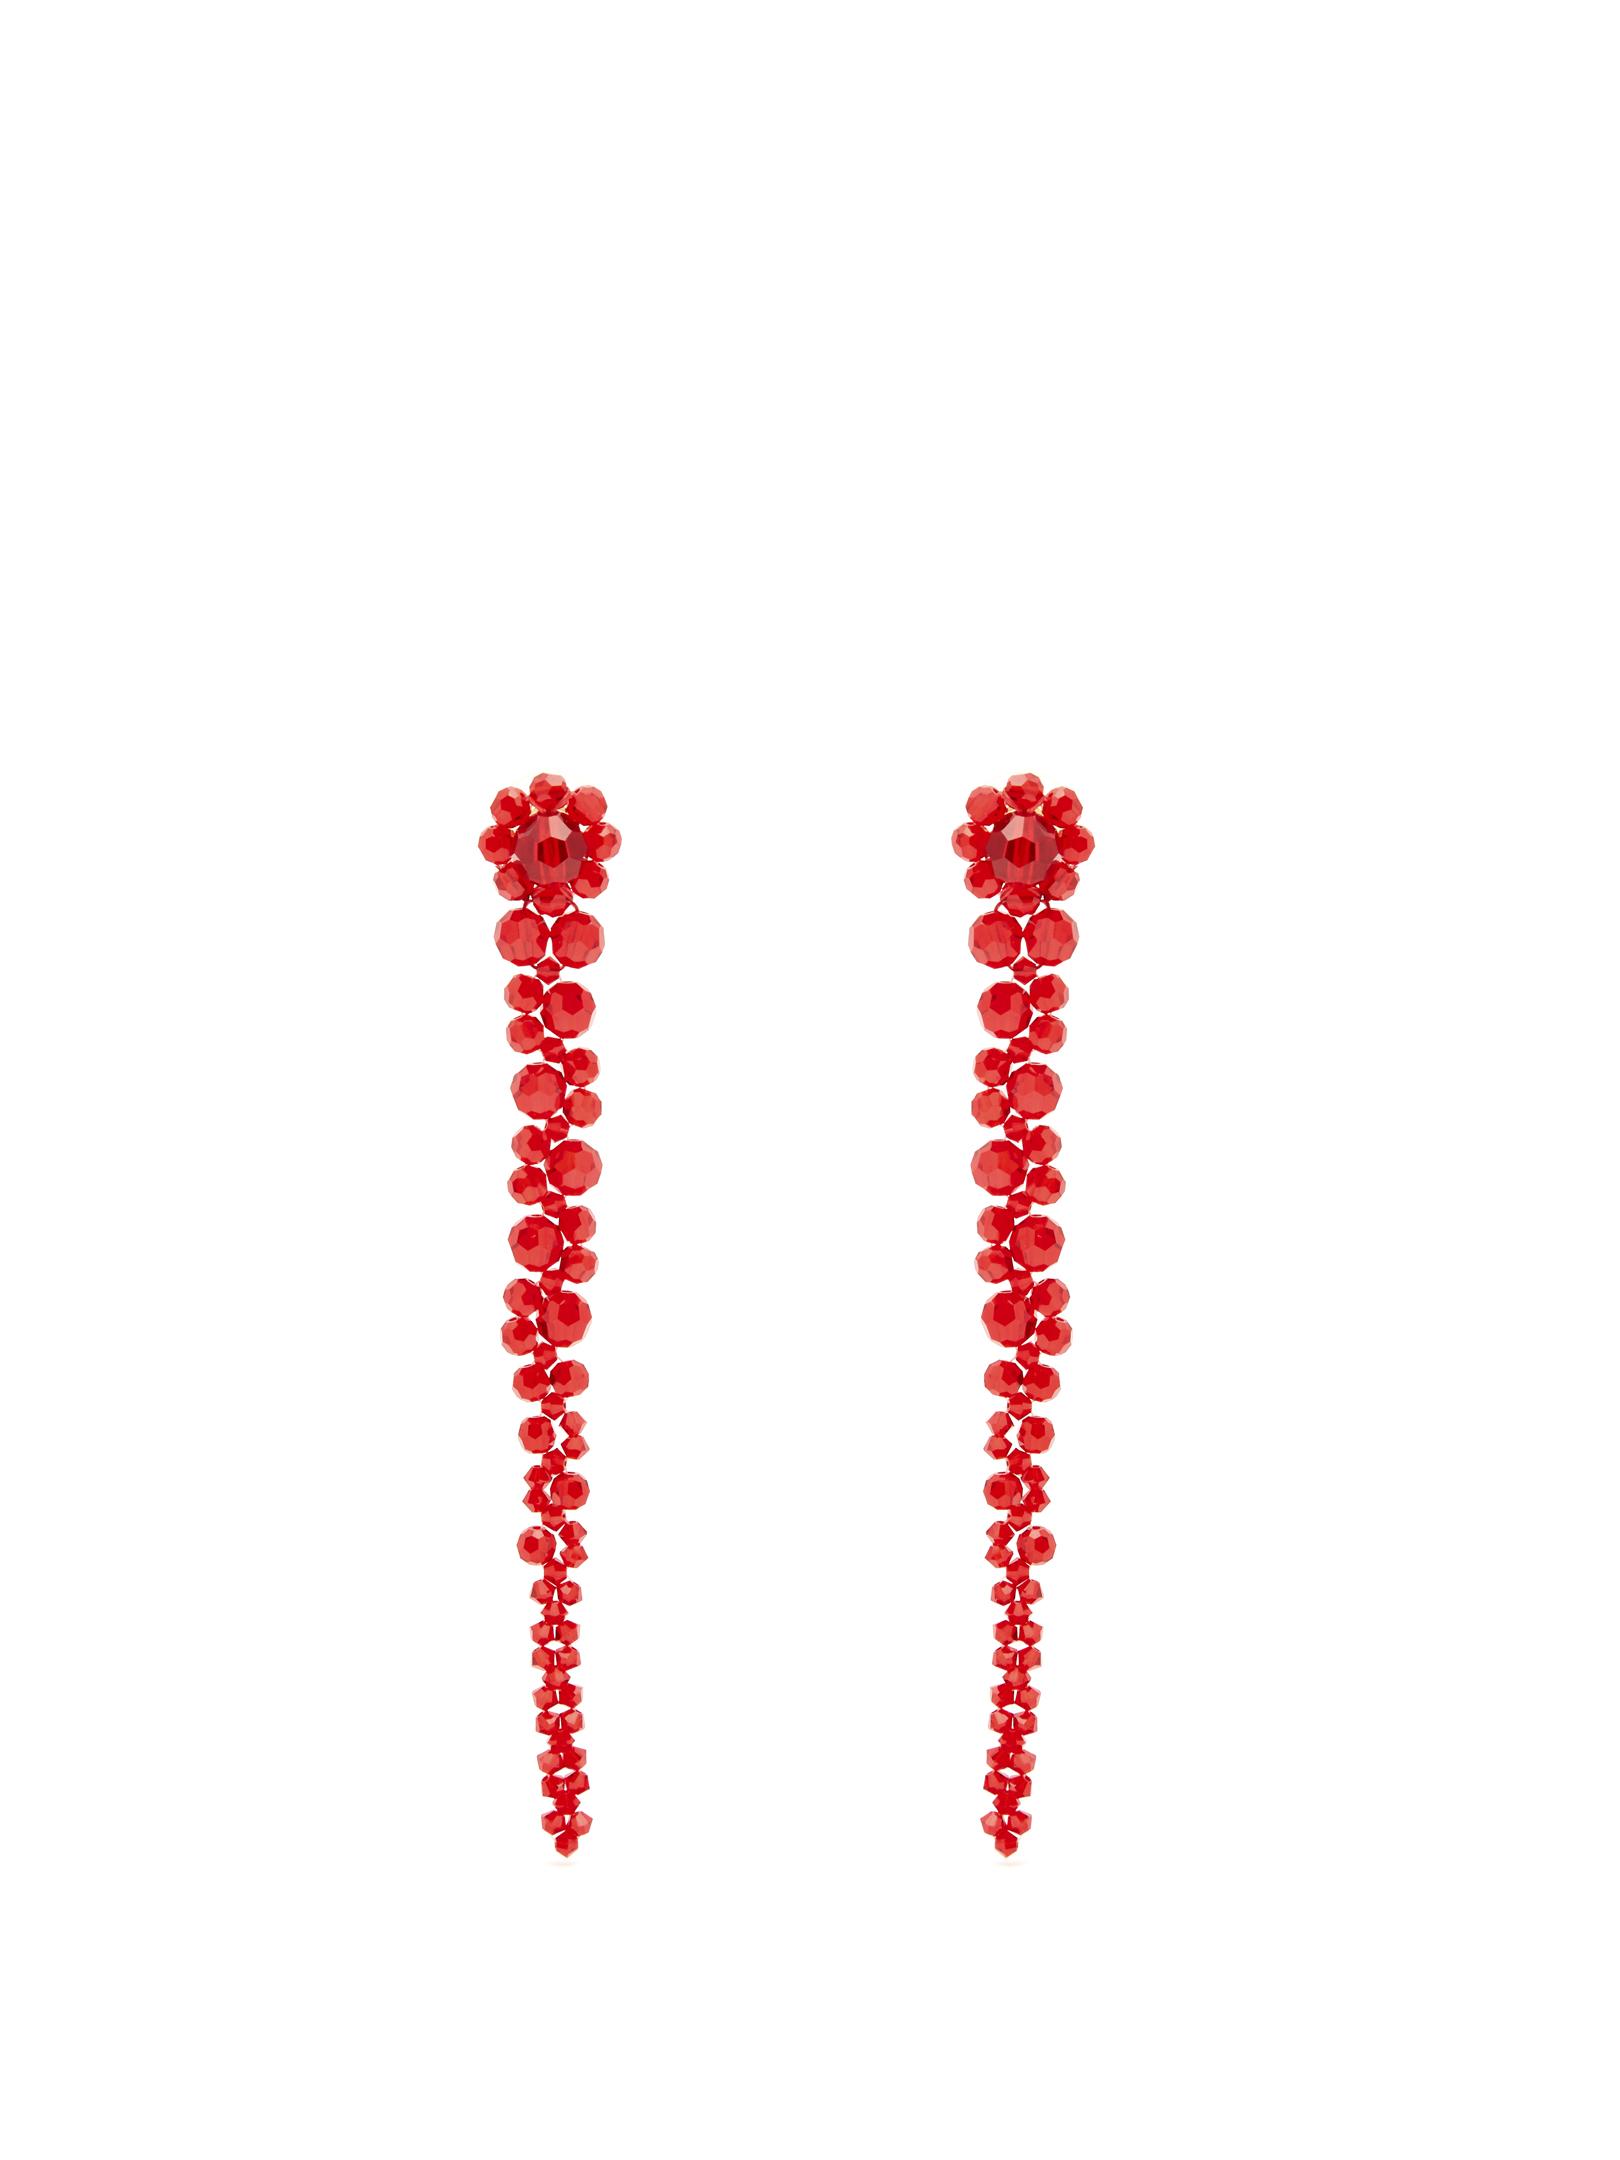 Simone Rocha Beaded Earrings